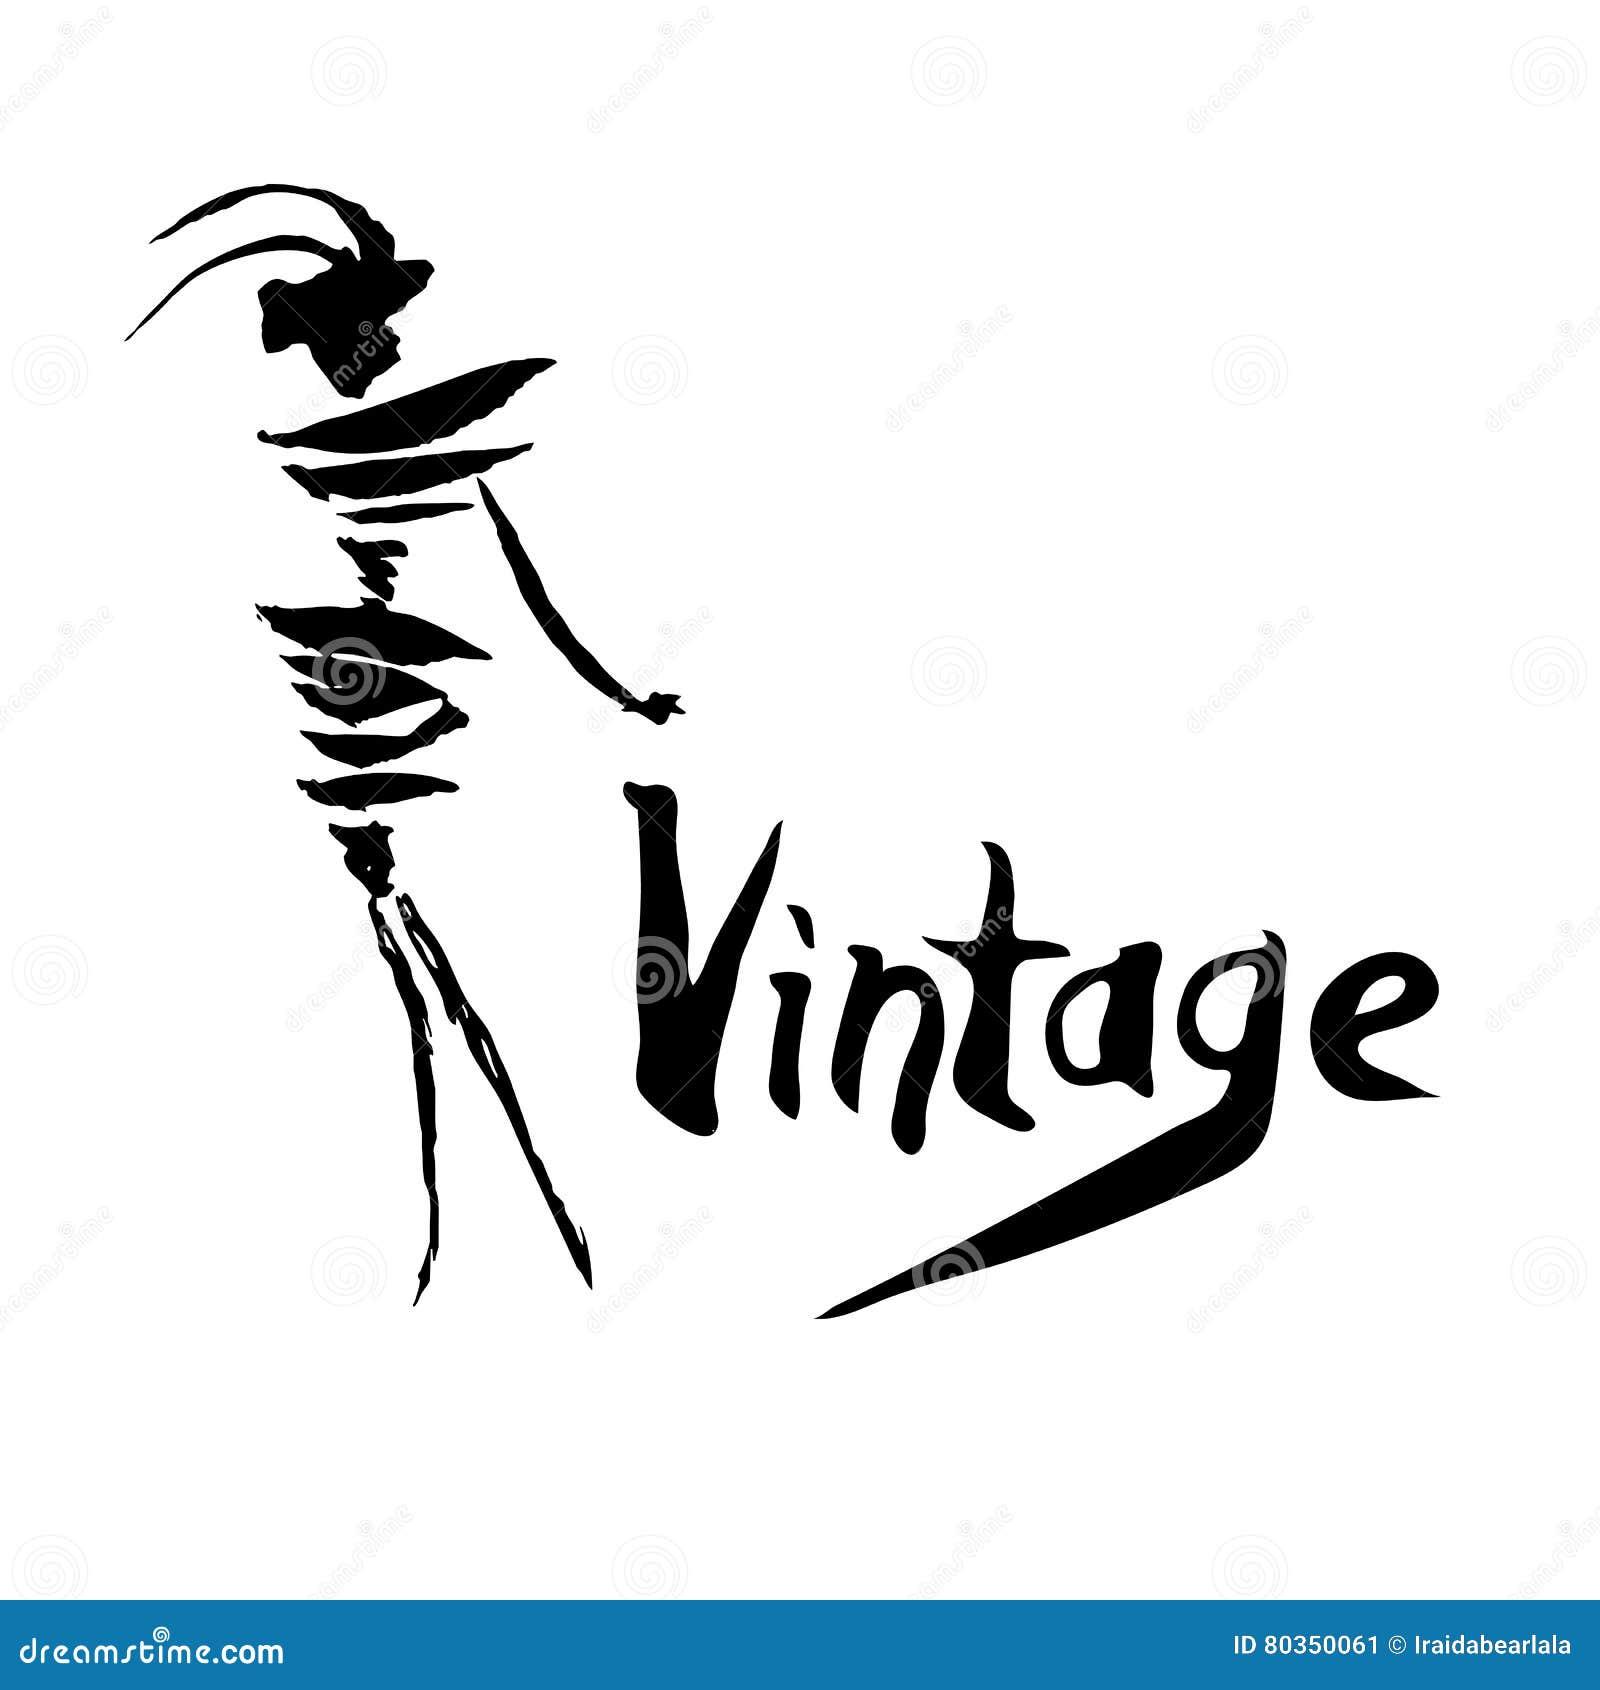 Vintage Logo Design Stock Vector Illustration Of Girl 80350061